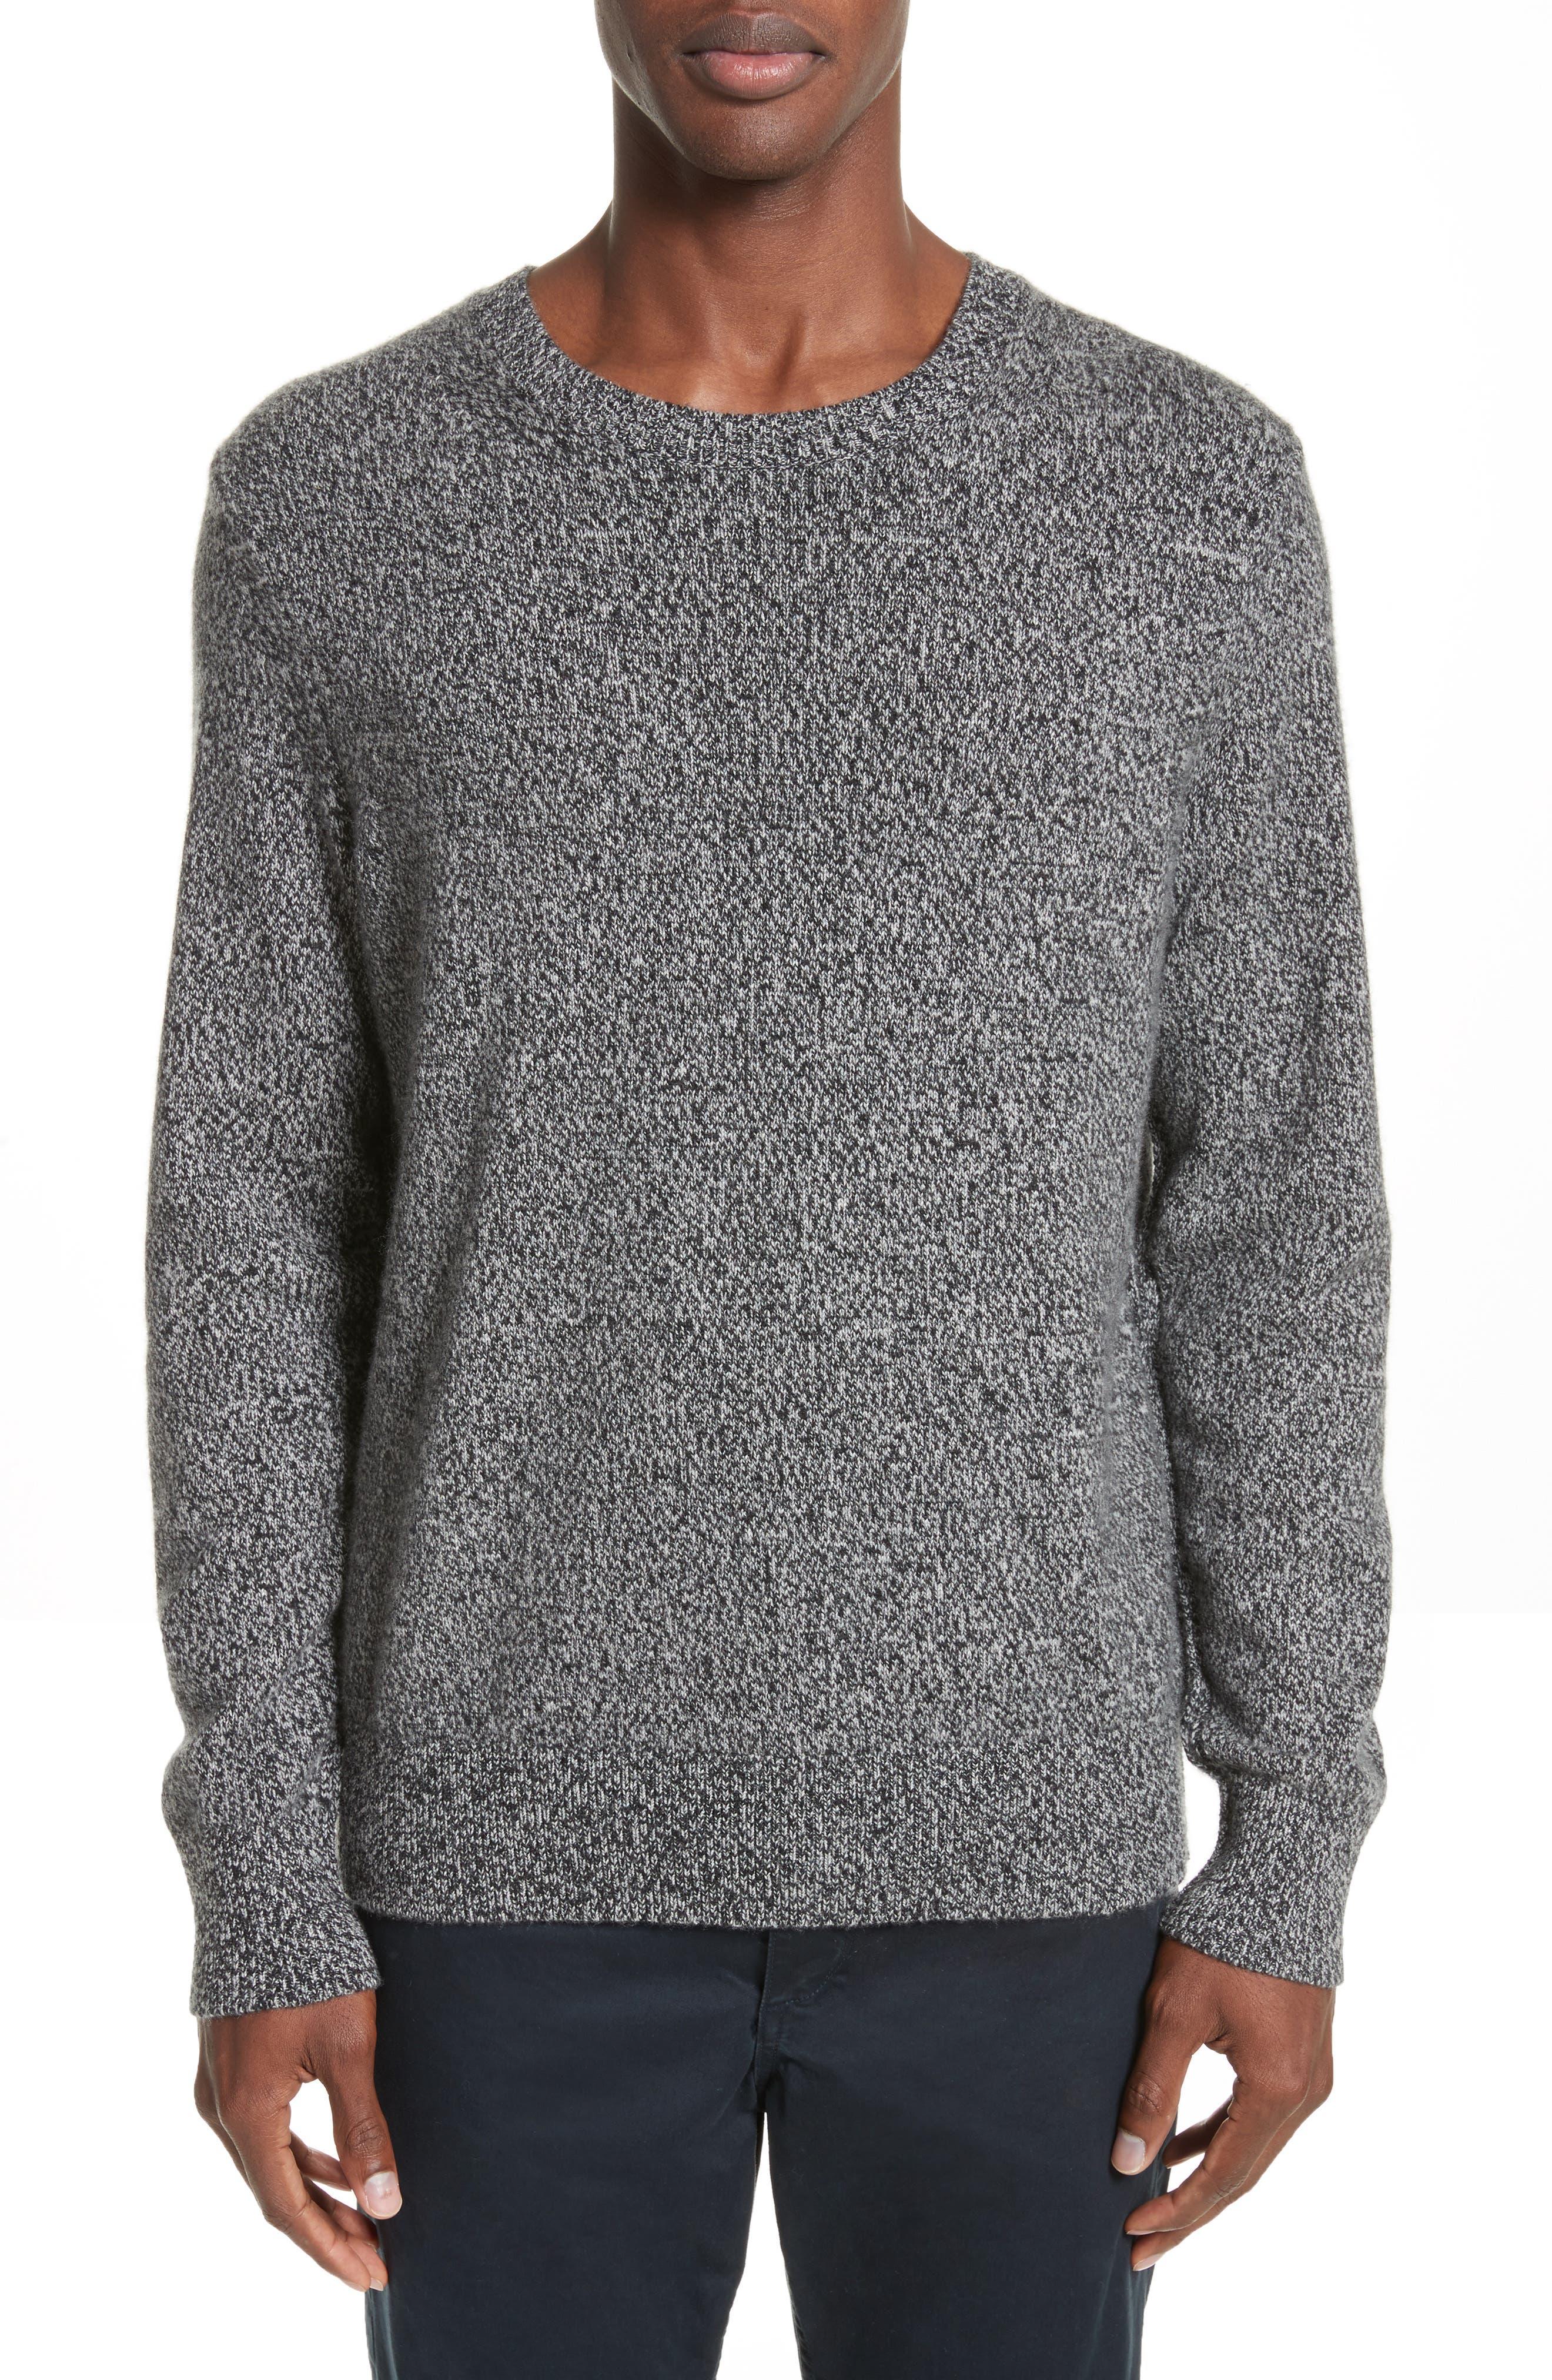 Holdon Cashmere Sweater,                             Main thumbnail 1, color,                             001